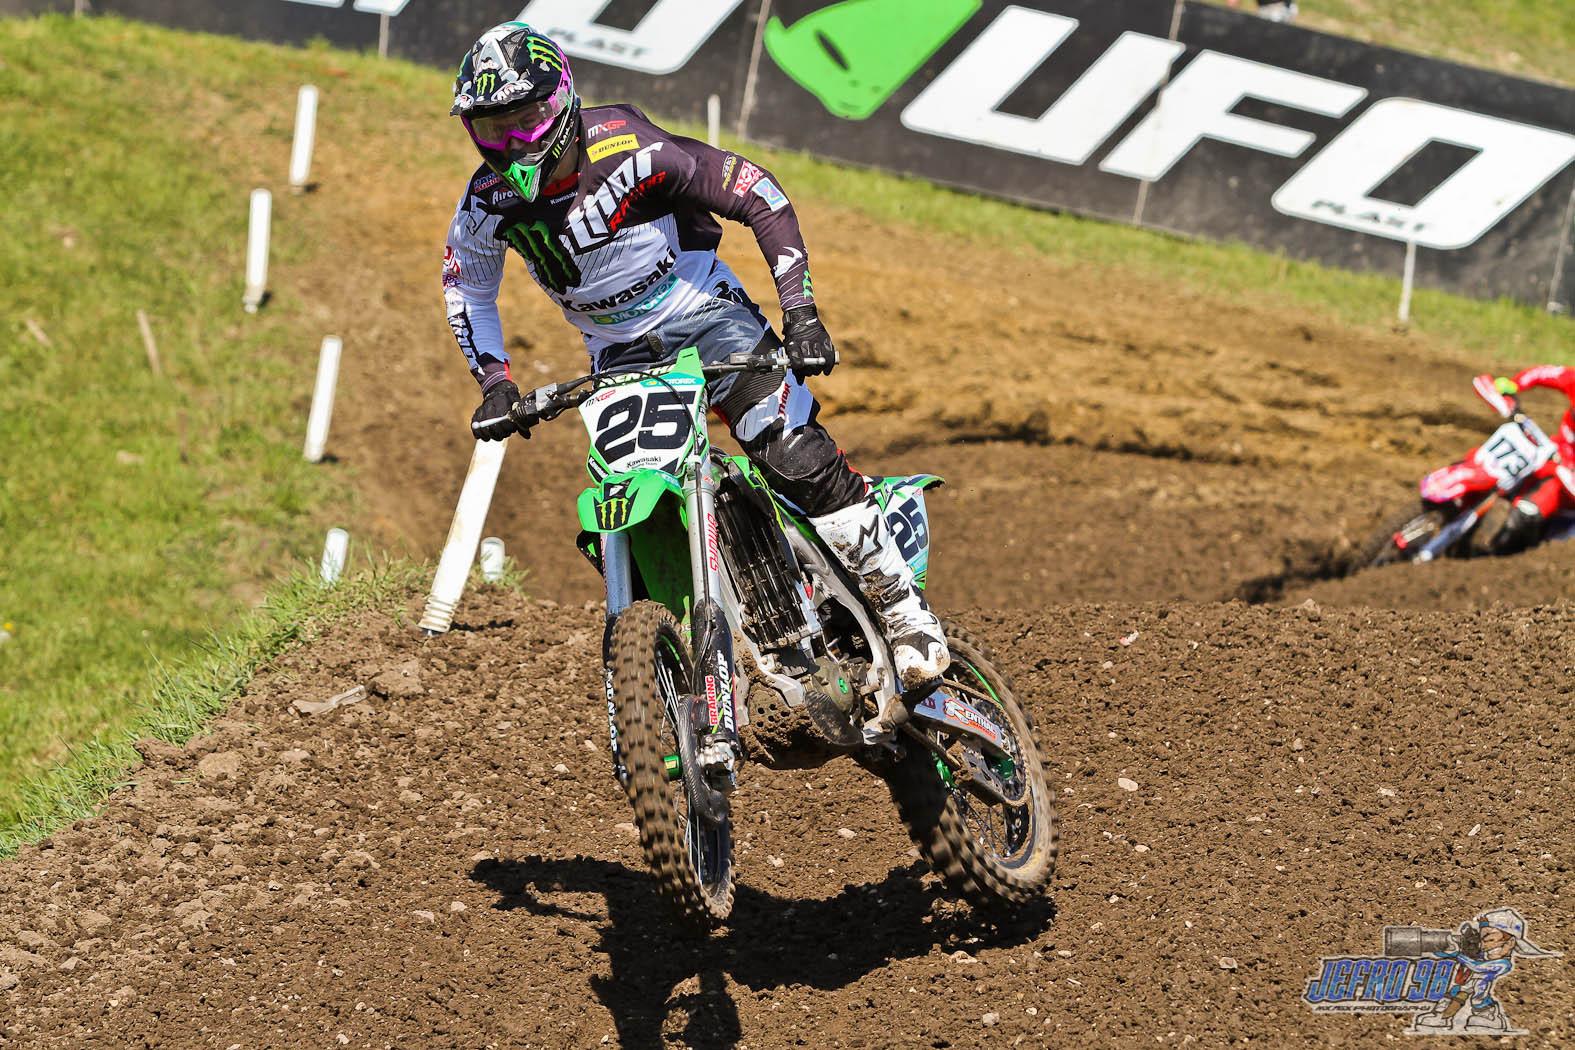 Clement Desalle - Photo Blast: MXGP of Germany - Motocross Pictures - Vital MX